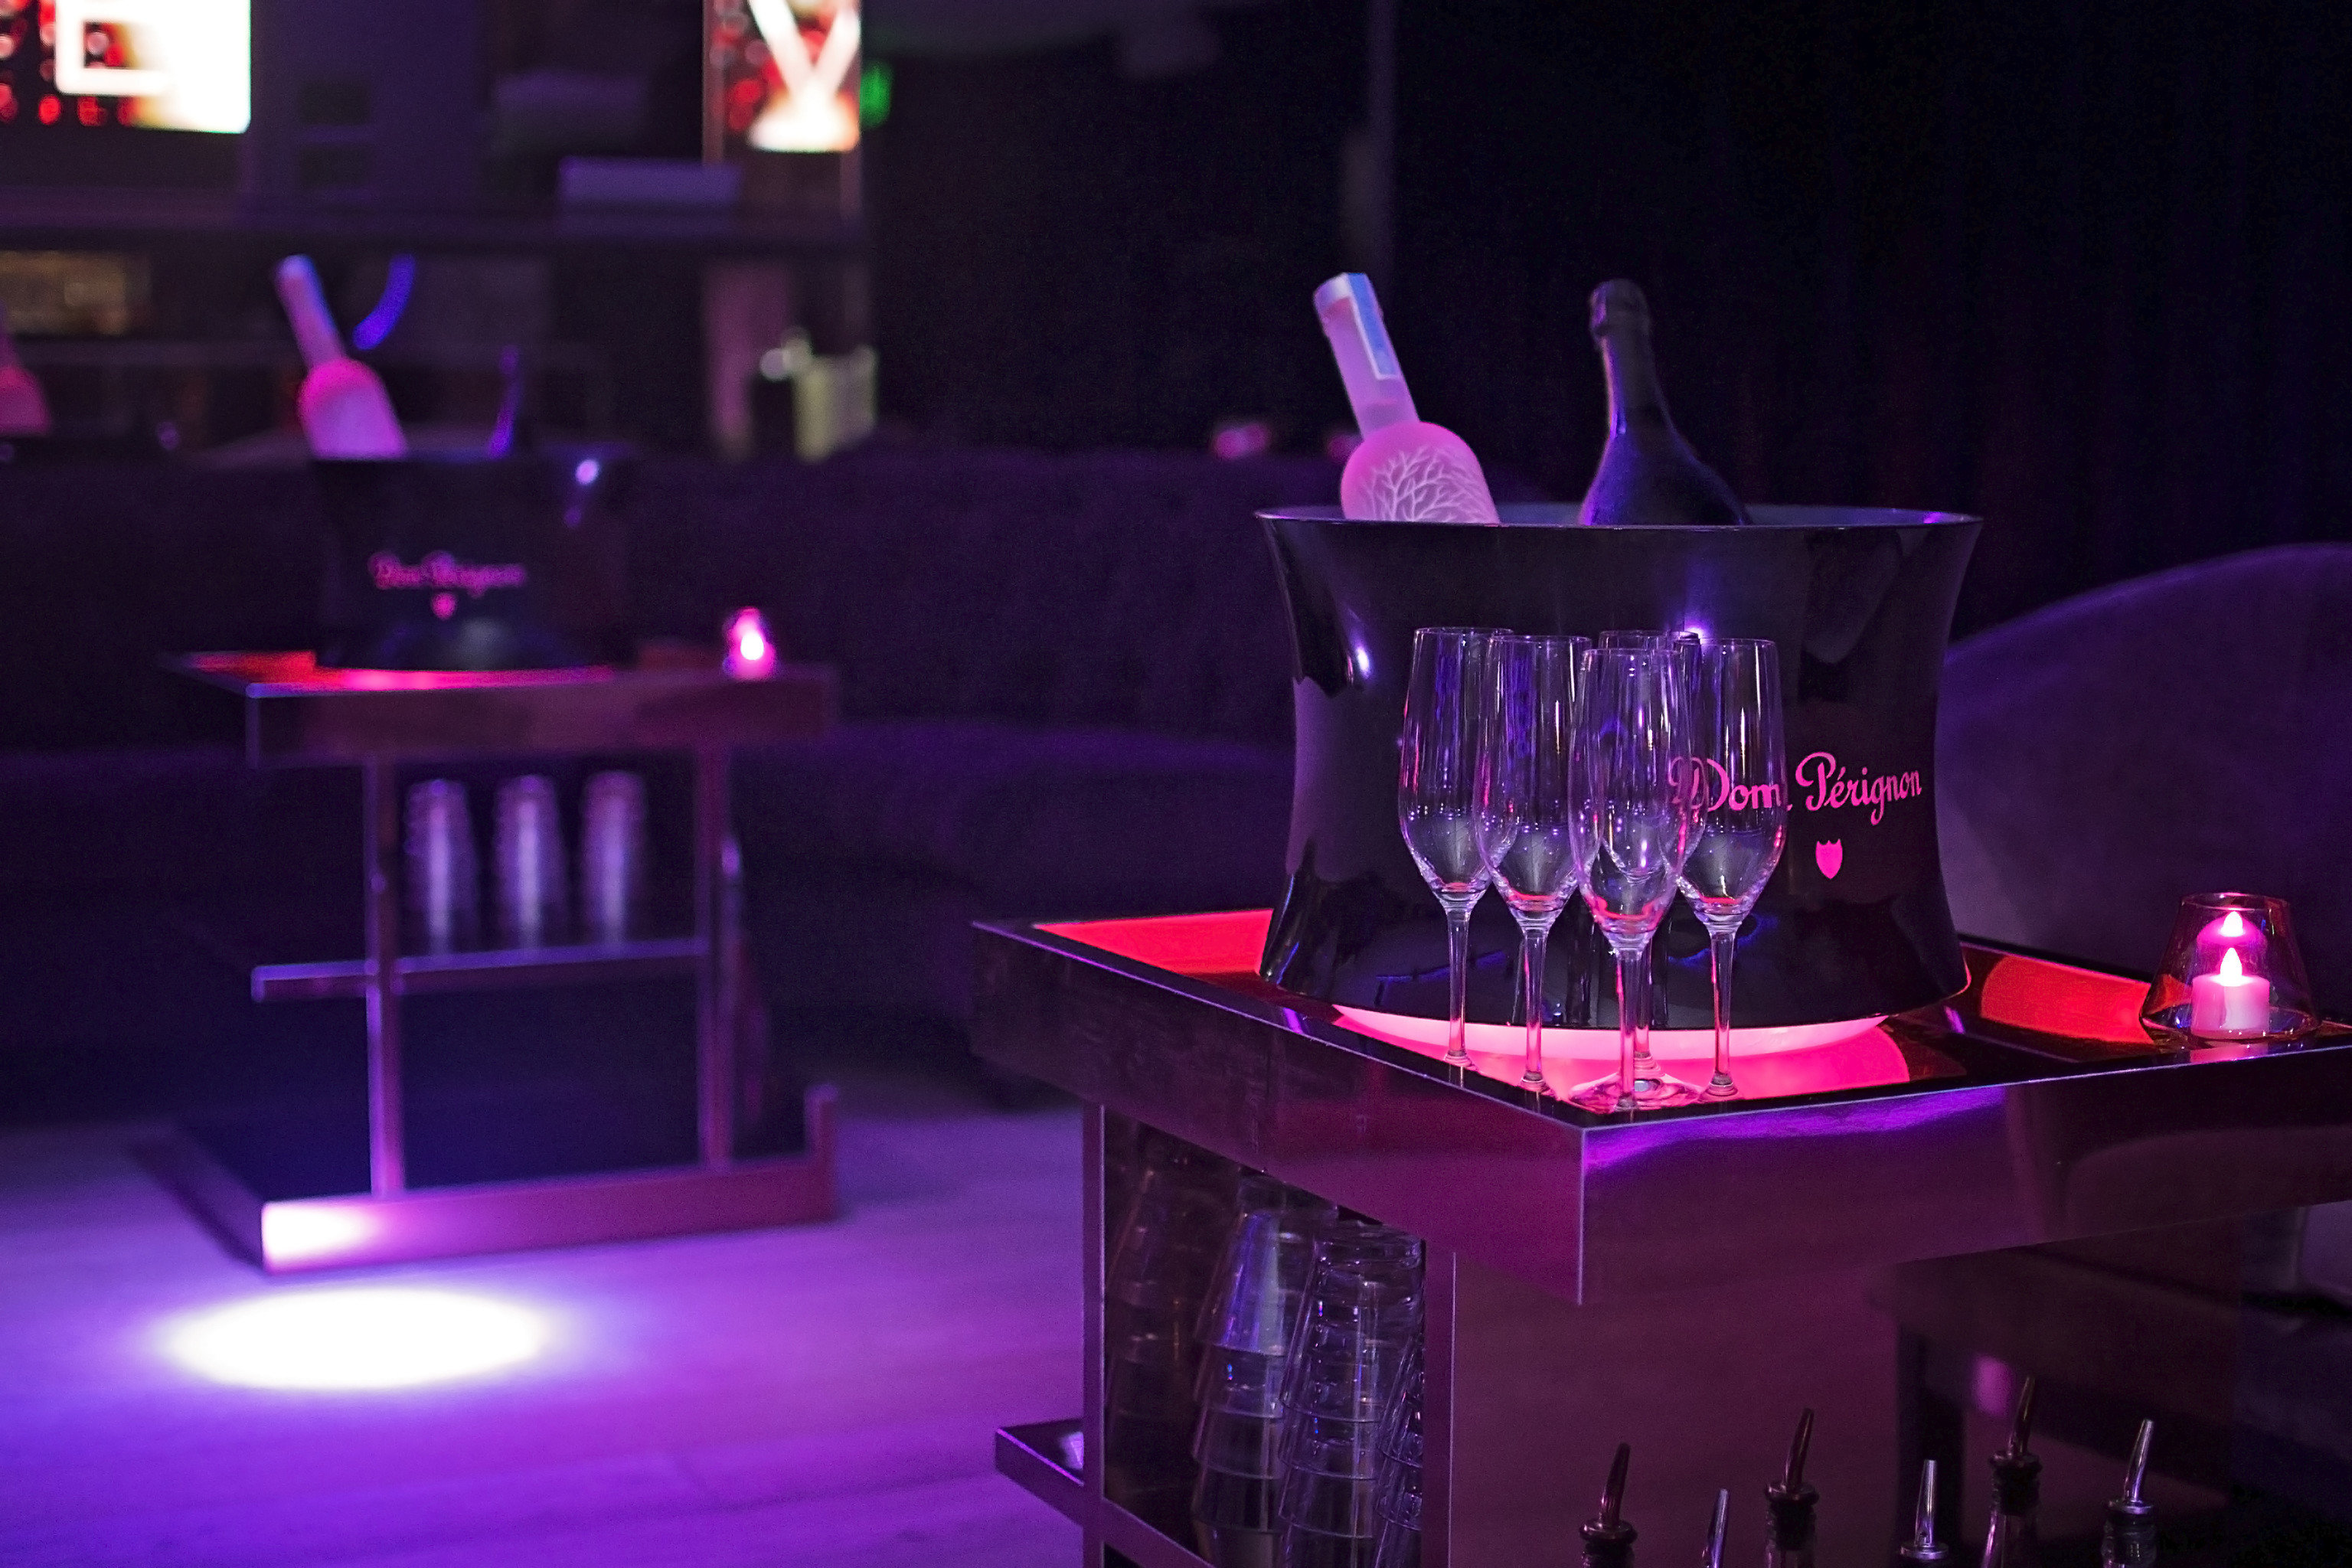 Trip Ideas indoor candle lit stage nightclub disco lighting Bar musical theatre purple scenographer dark